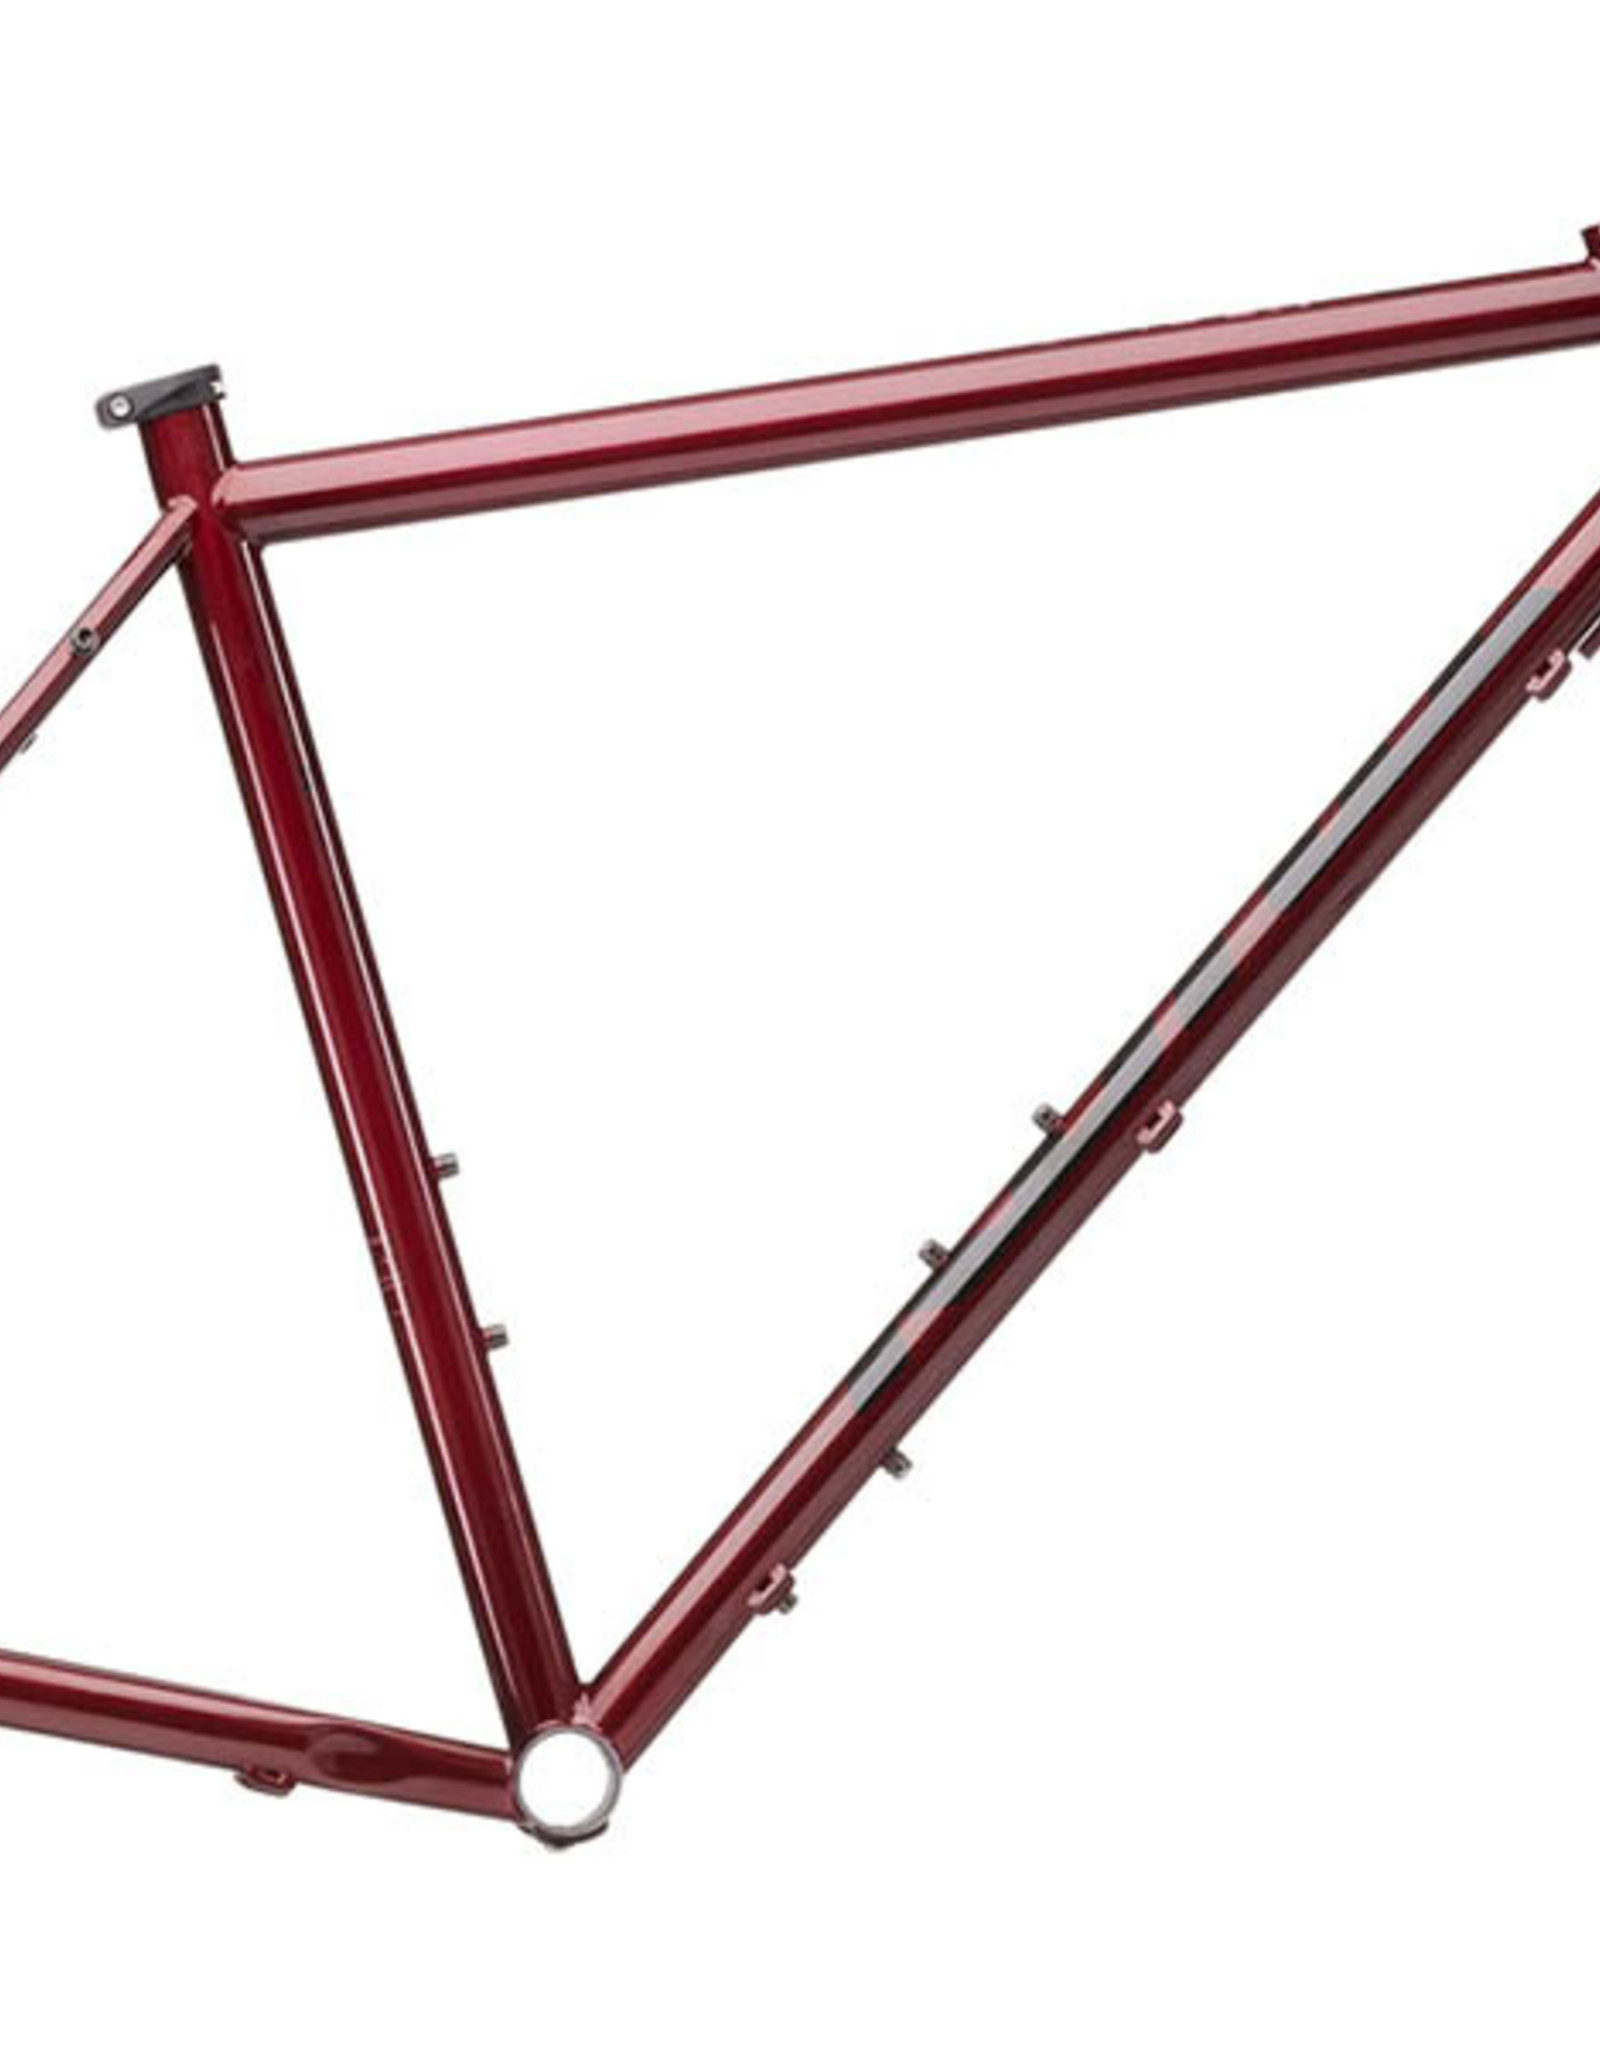 Kona Kona Rove LTD Frame w/Kona Carbon Rove Fork 2021